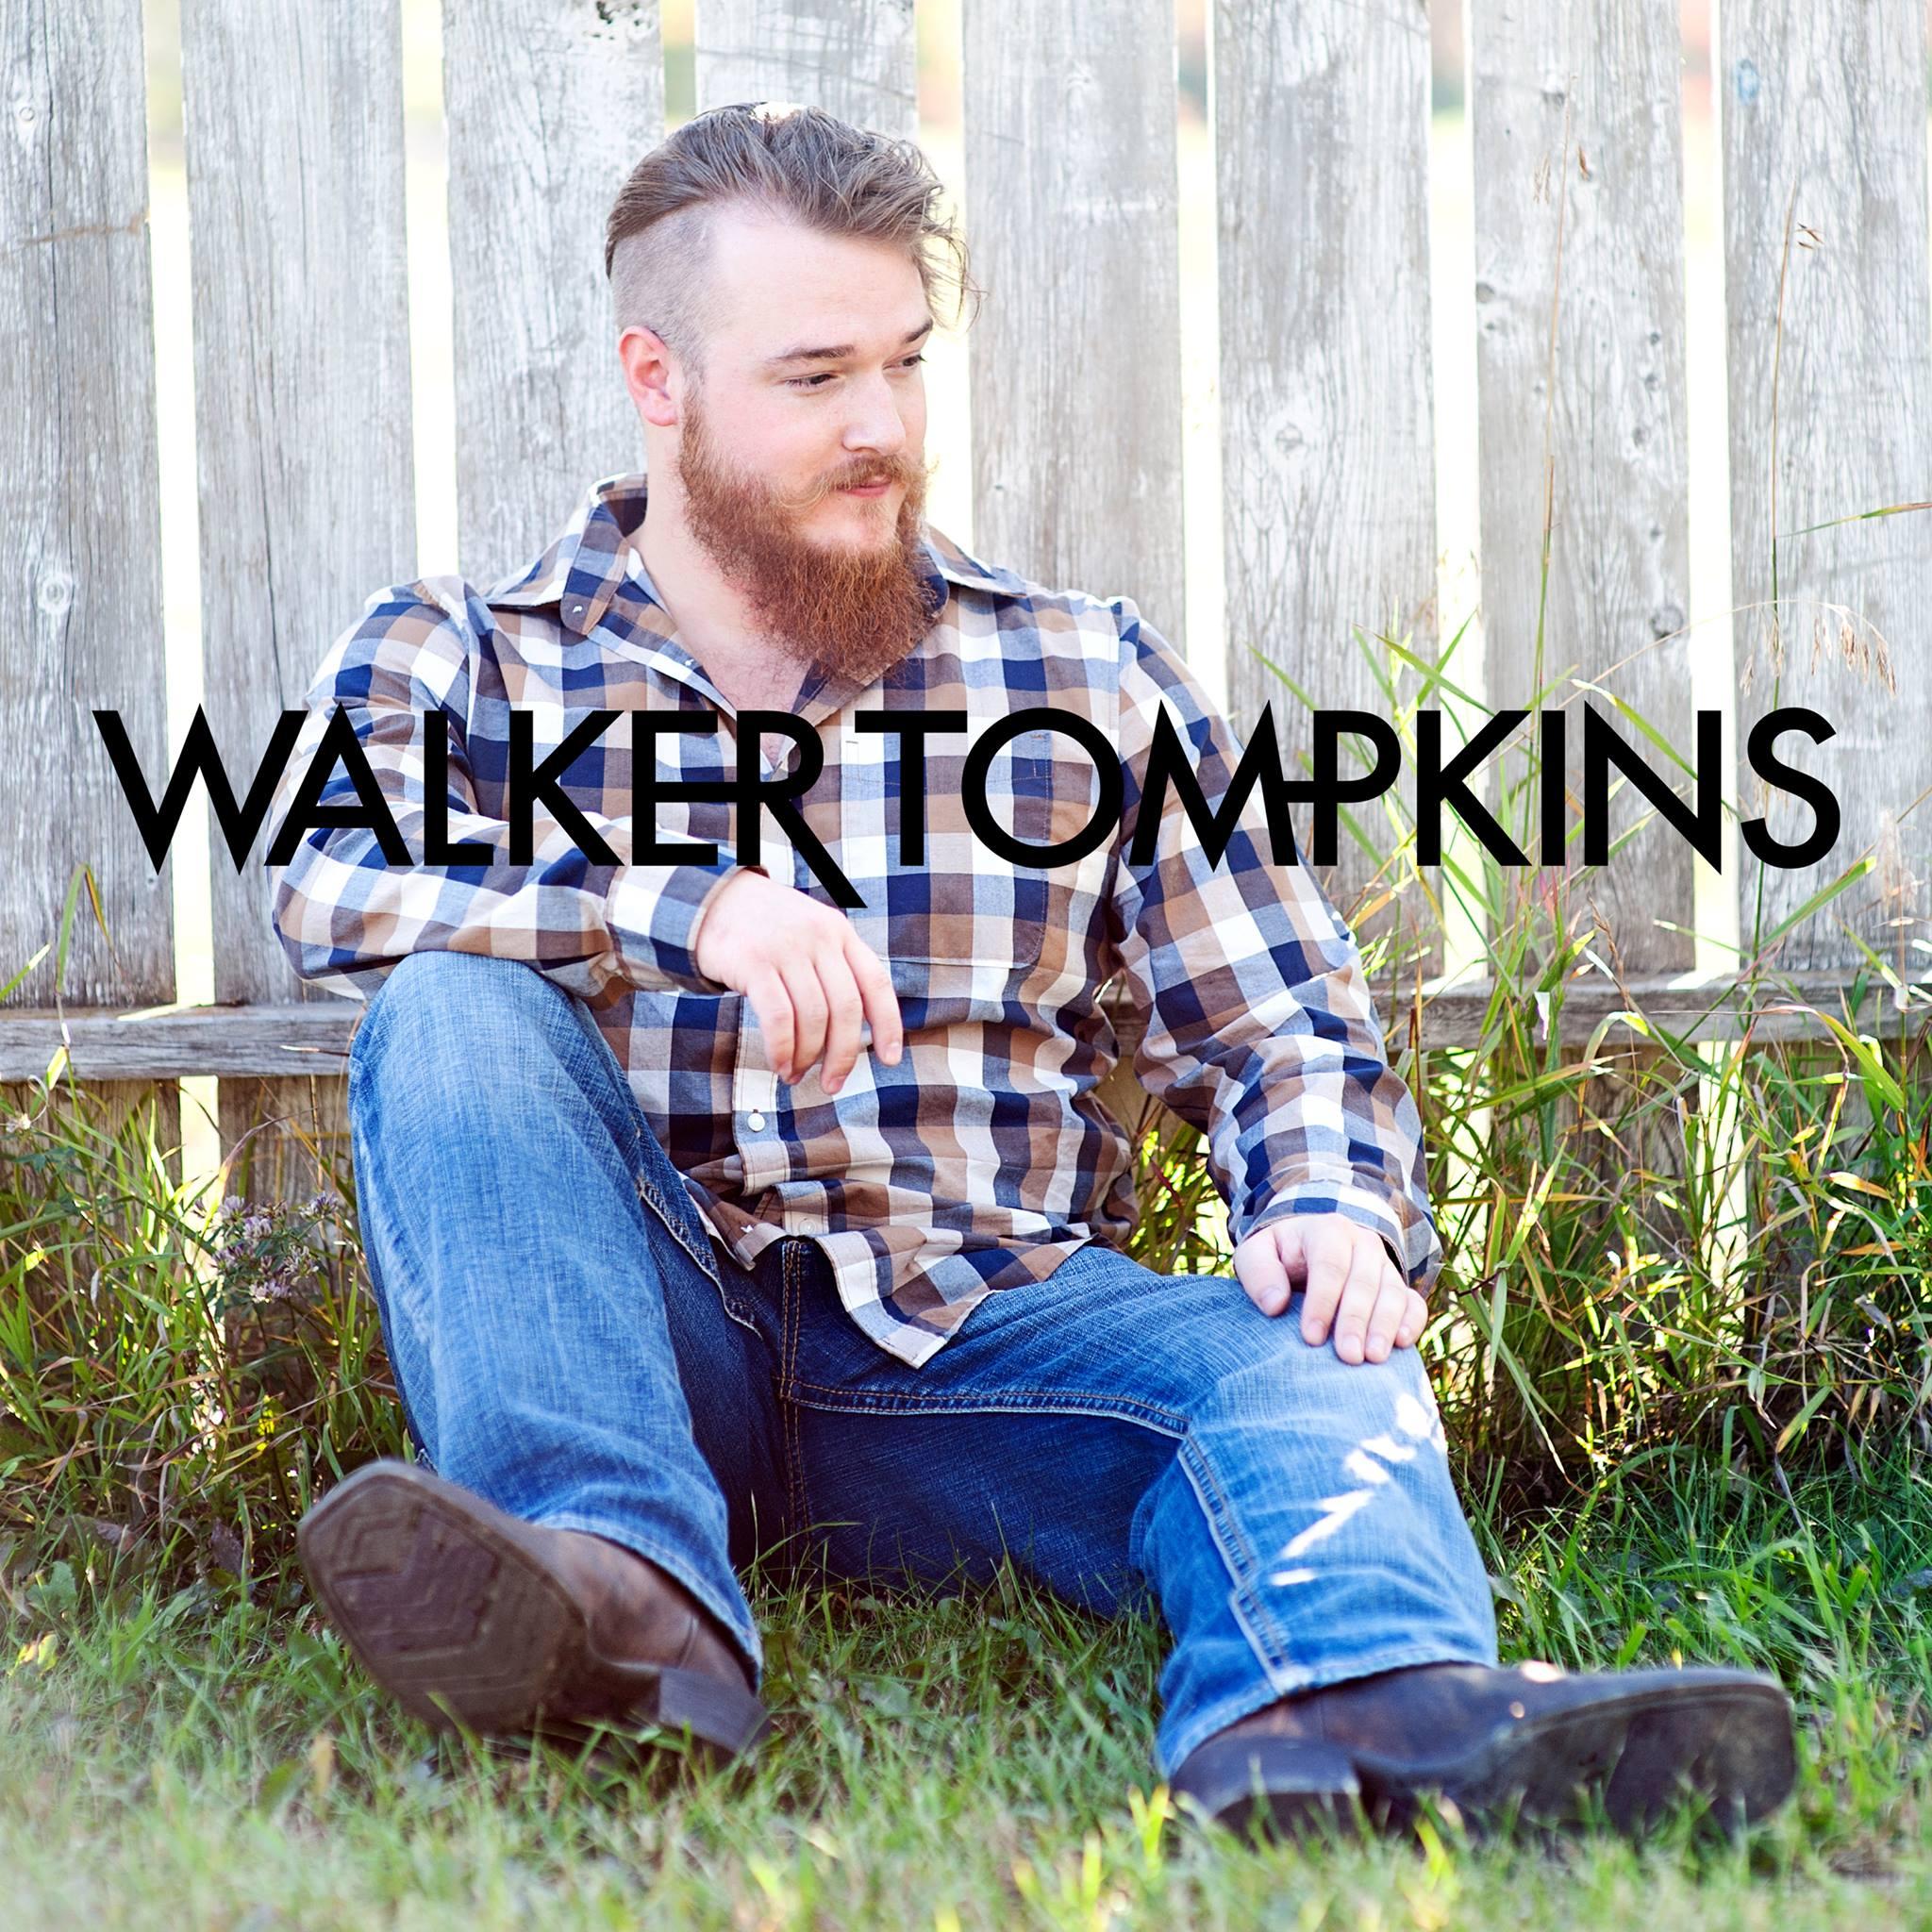 Walker Tompkins